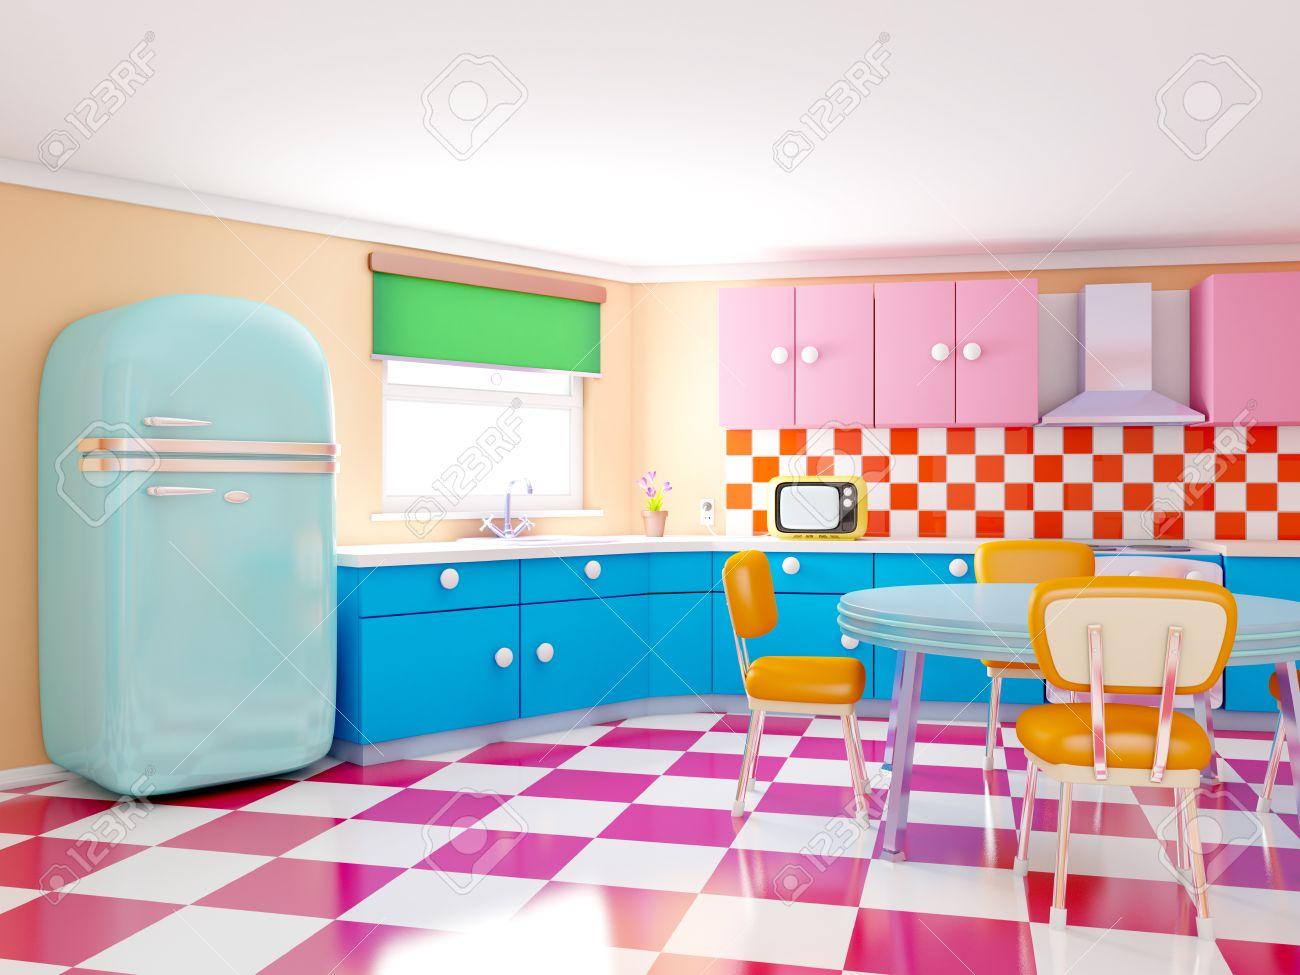 retro kitchen. Illustration  Retro Kitchen In Cartoon Style With Checkered Floor 3d Illustration Kitchen In Cartoon Style With Checkered Floor